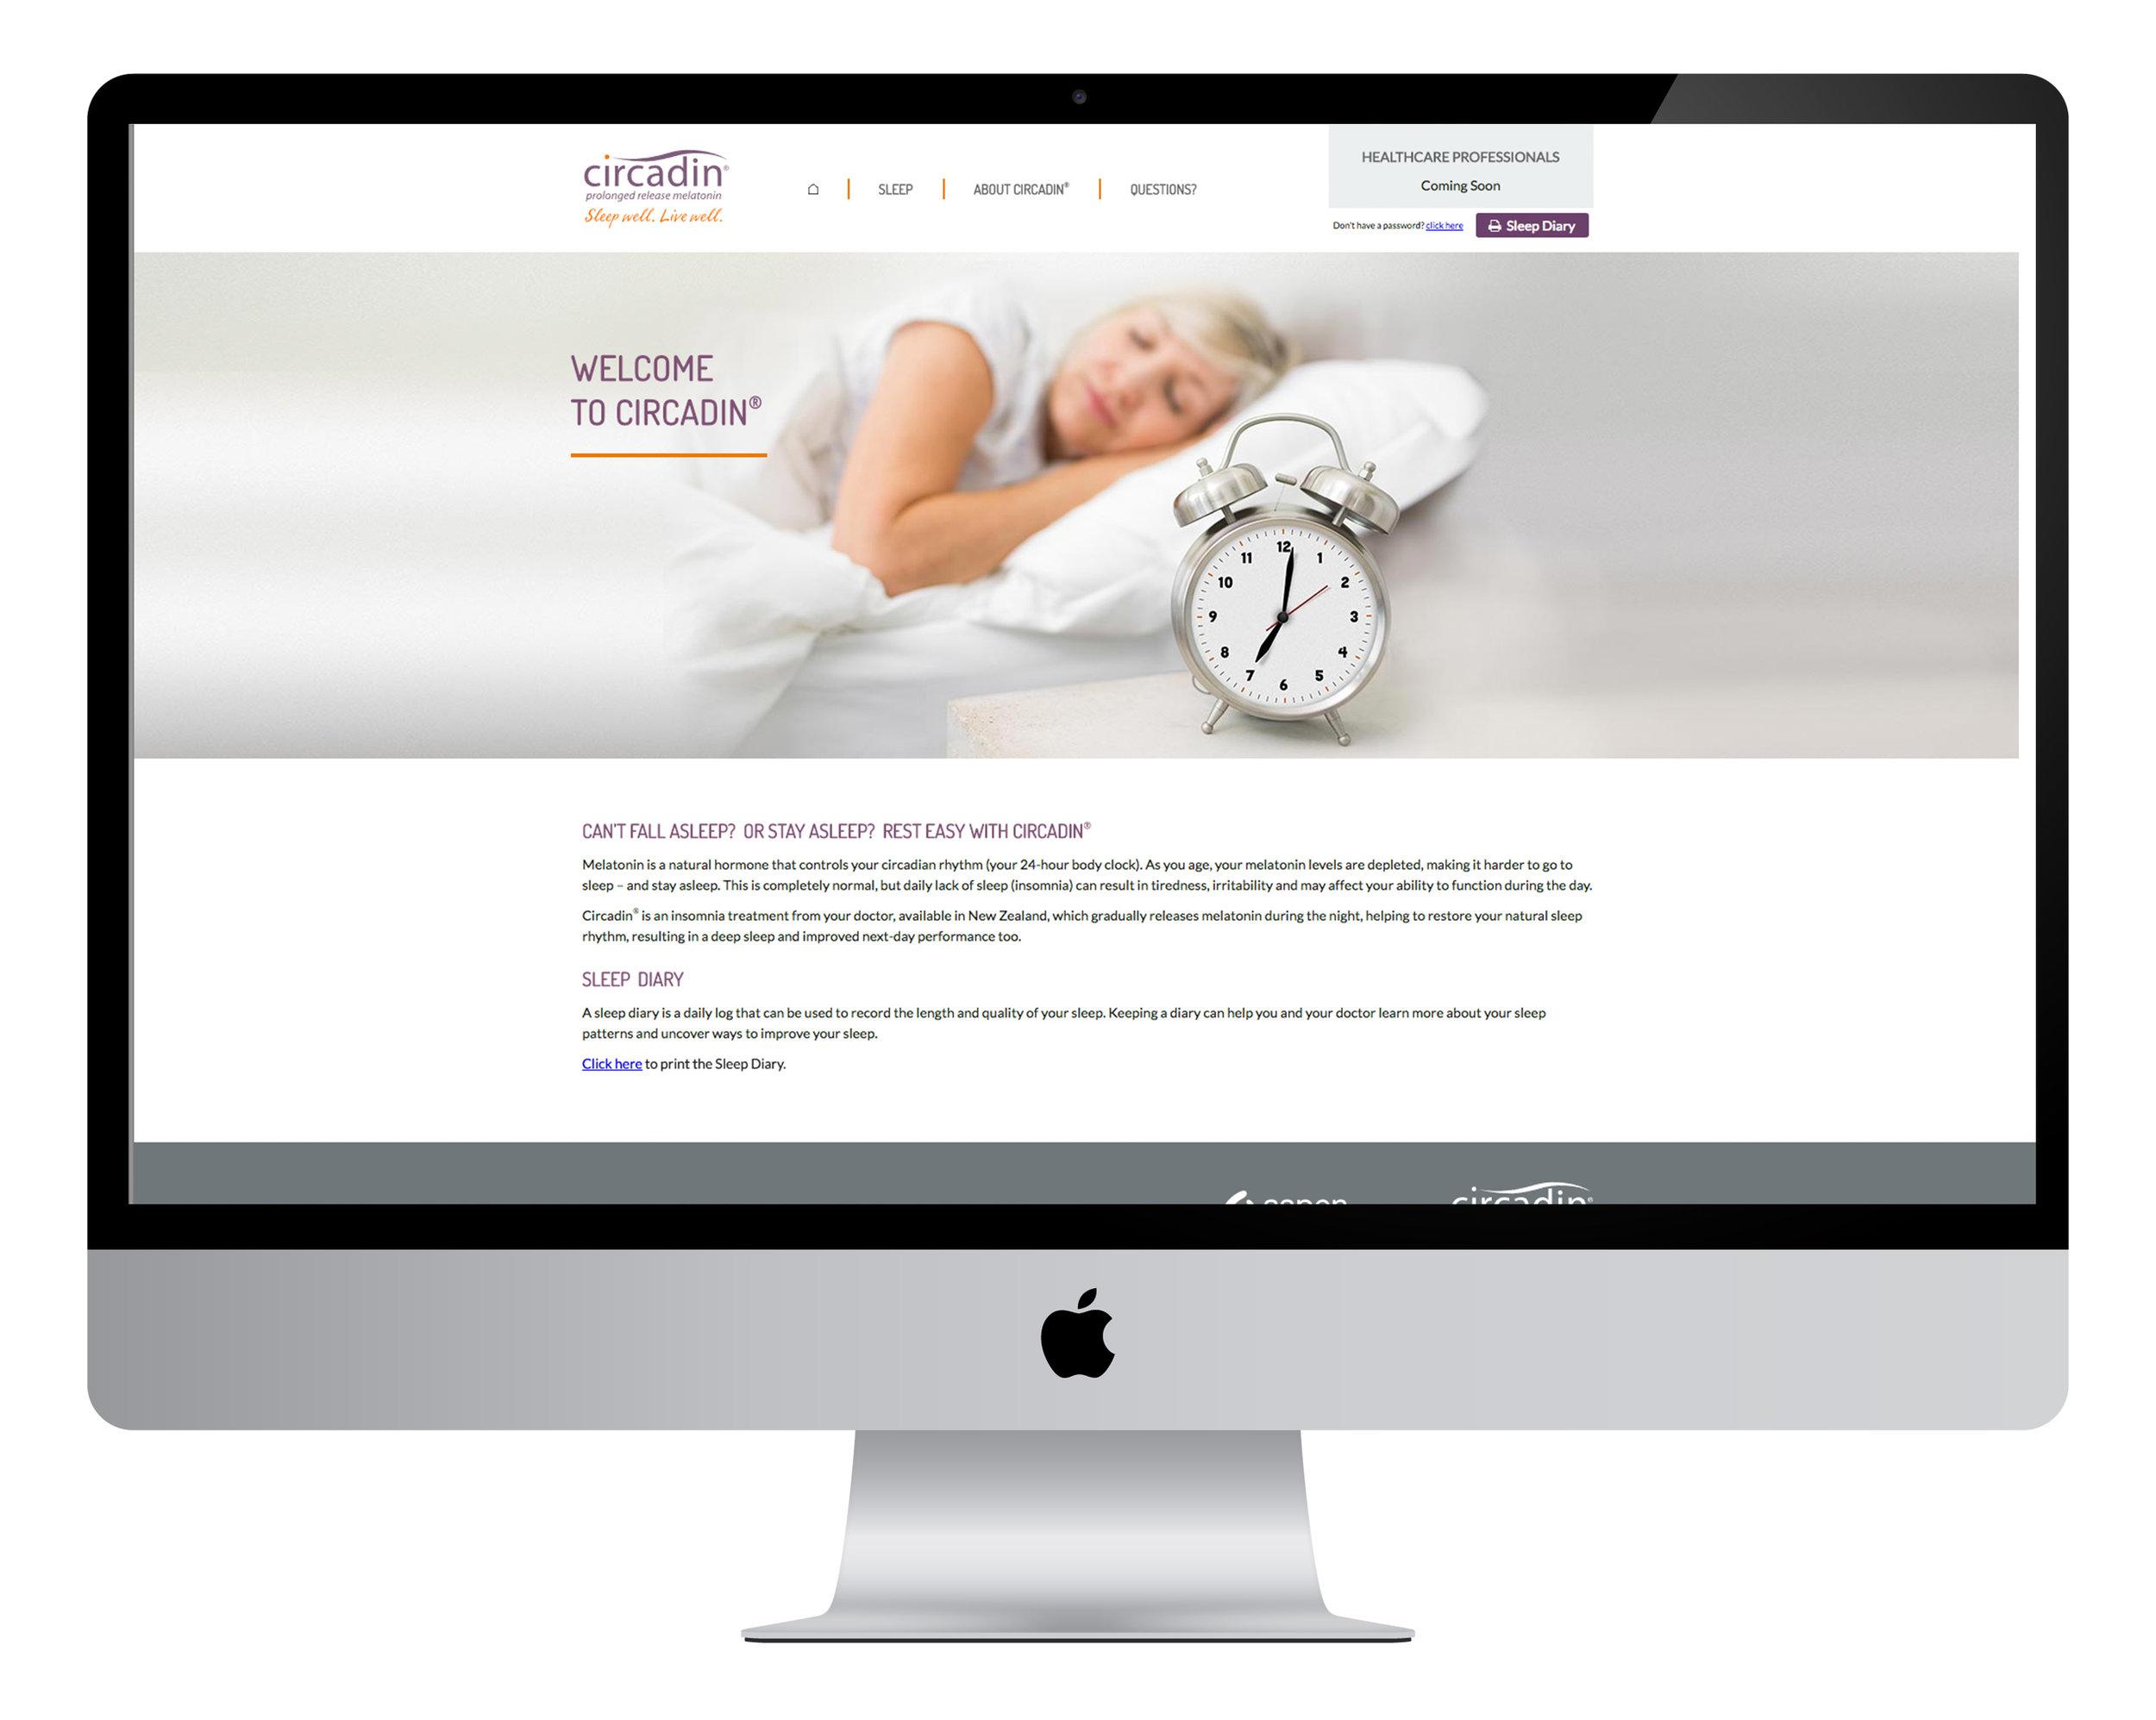 Circadin - consumer and healthcare professional website:  creative direction, design